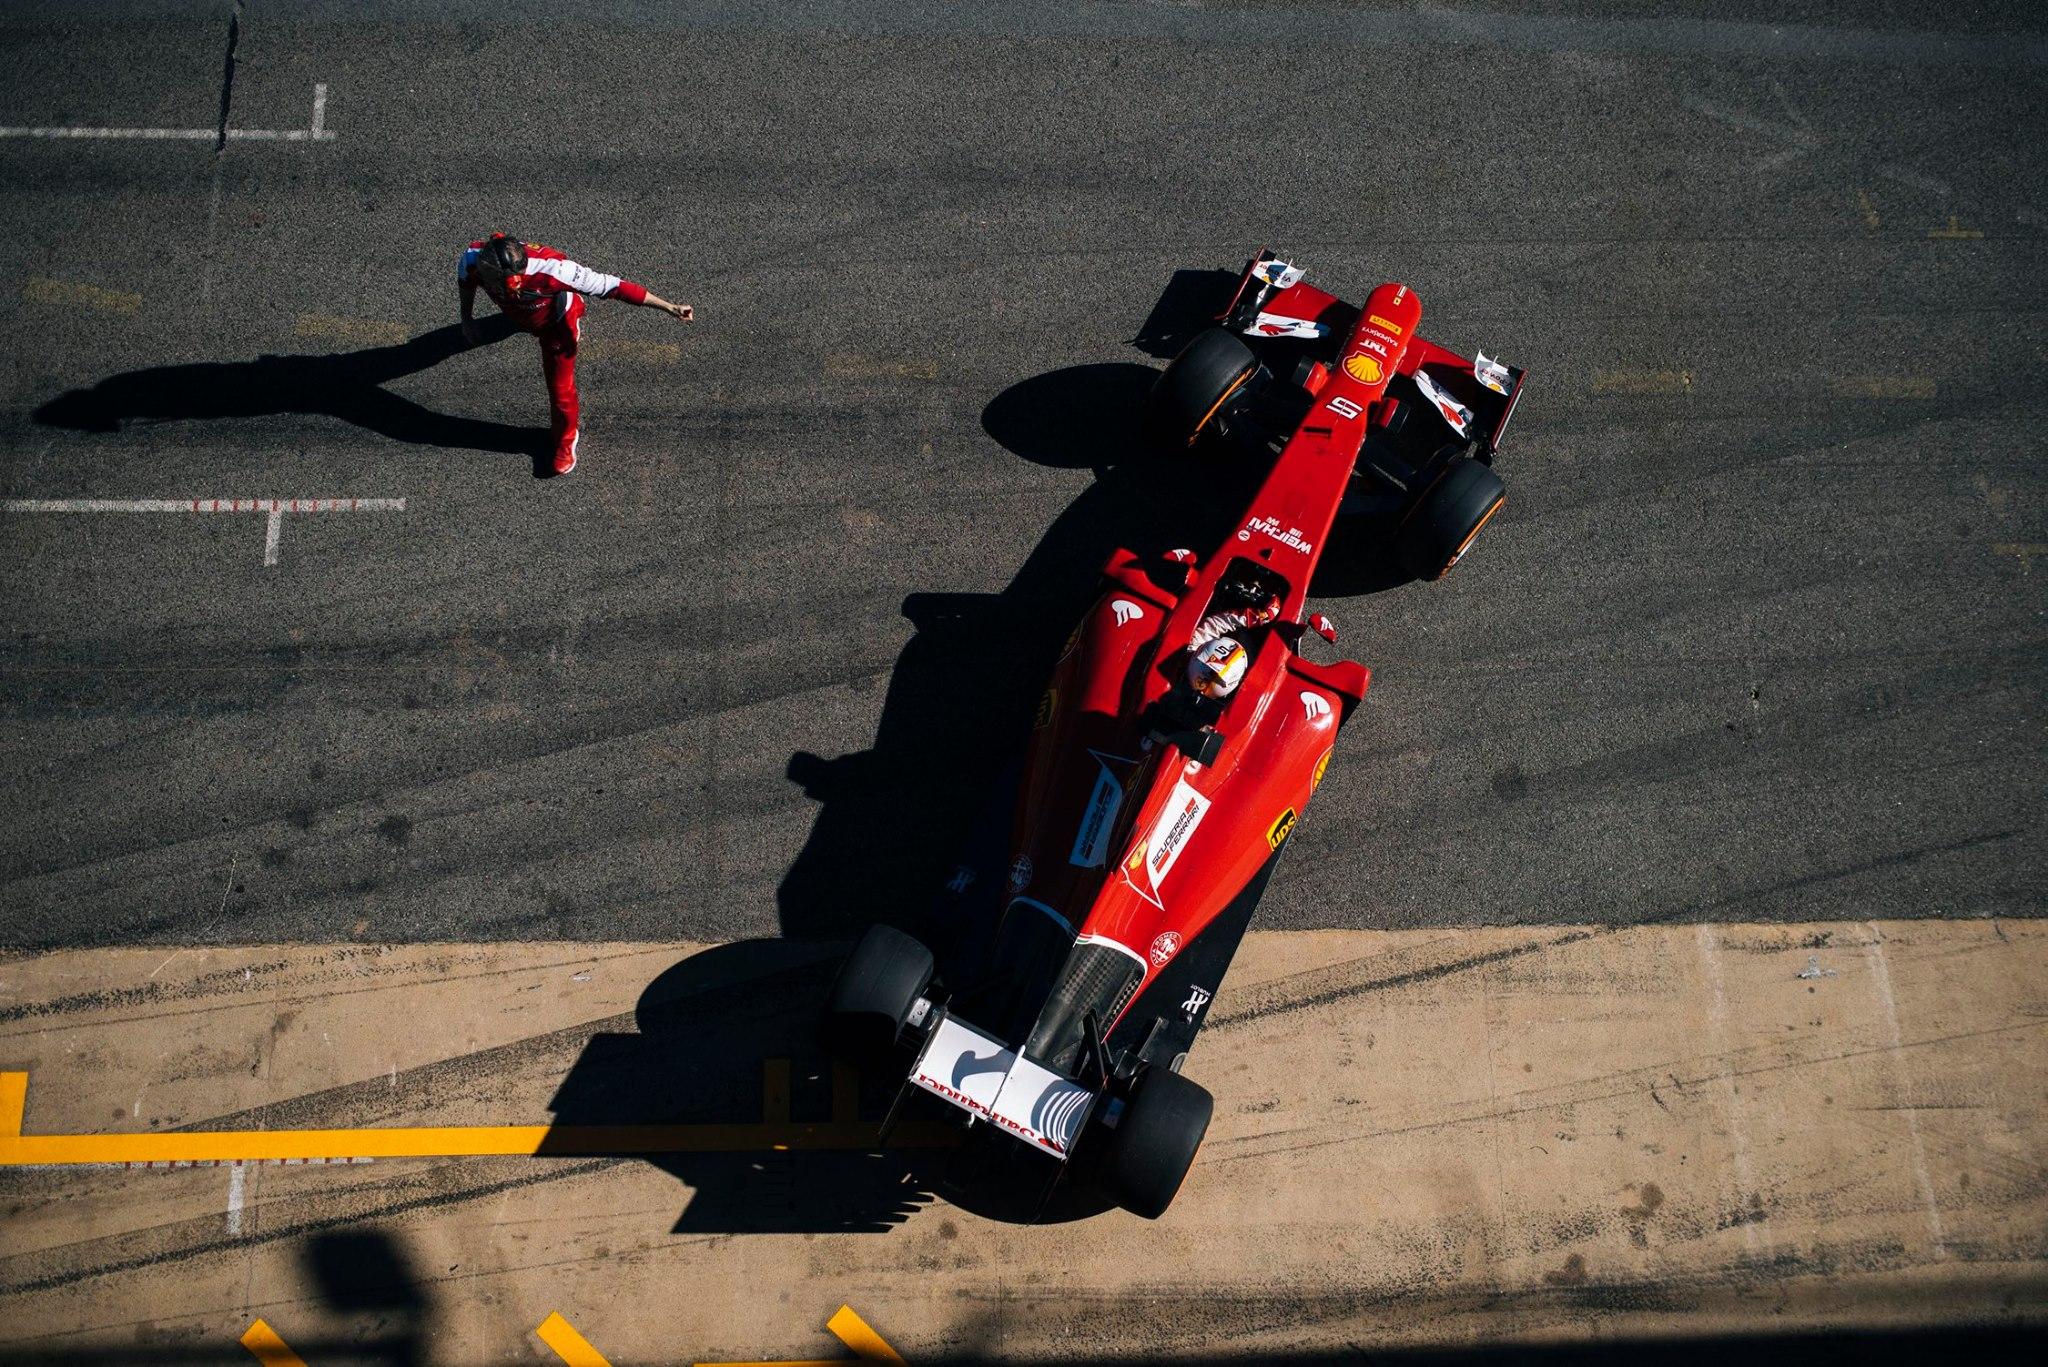 Sebastian Vettel Wallpapers Vettel Wallpaper Ferrari 2048x1367 Download Hd Wallpaper Wallpapertip